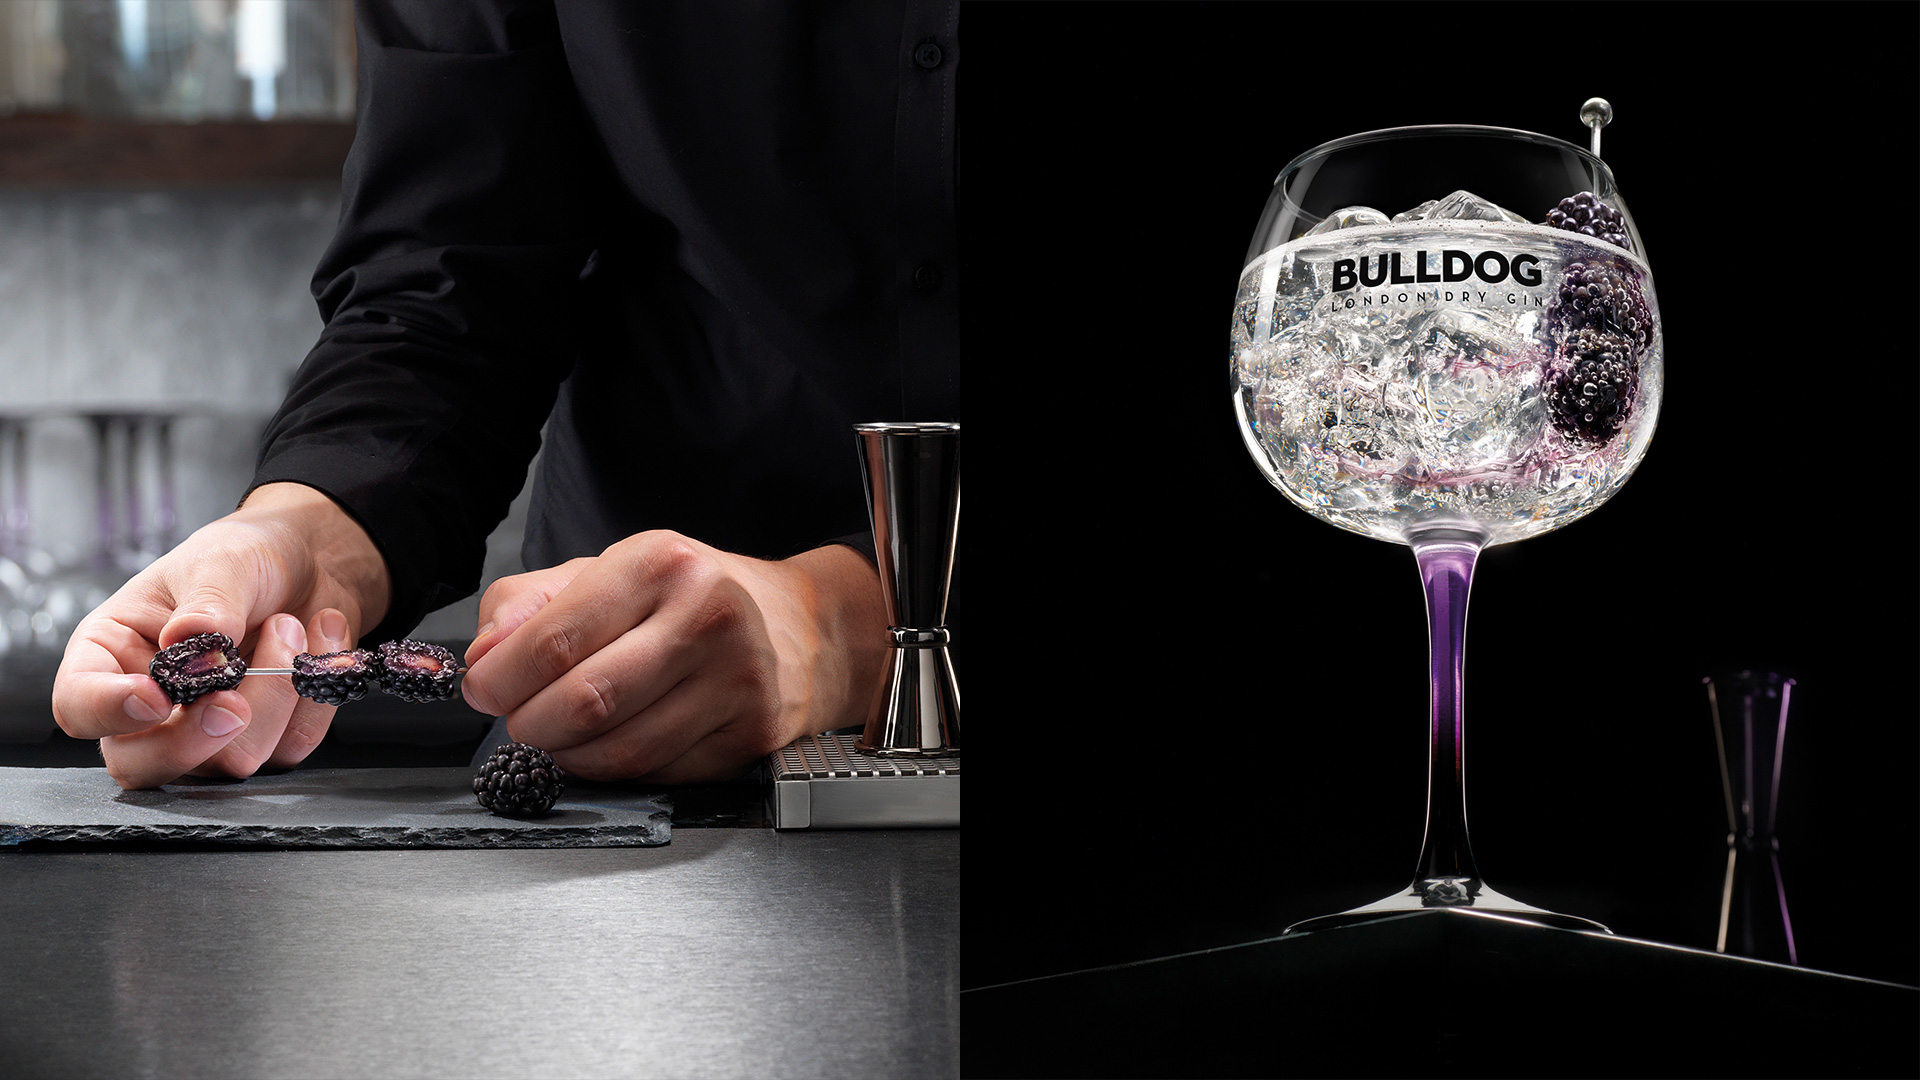 Bulldog-Rba-Design-004